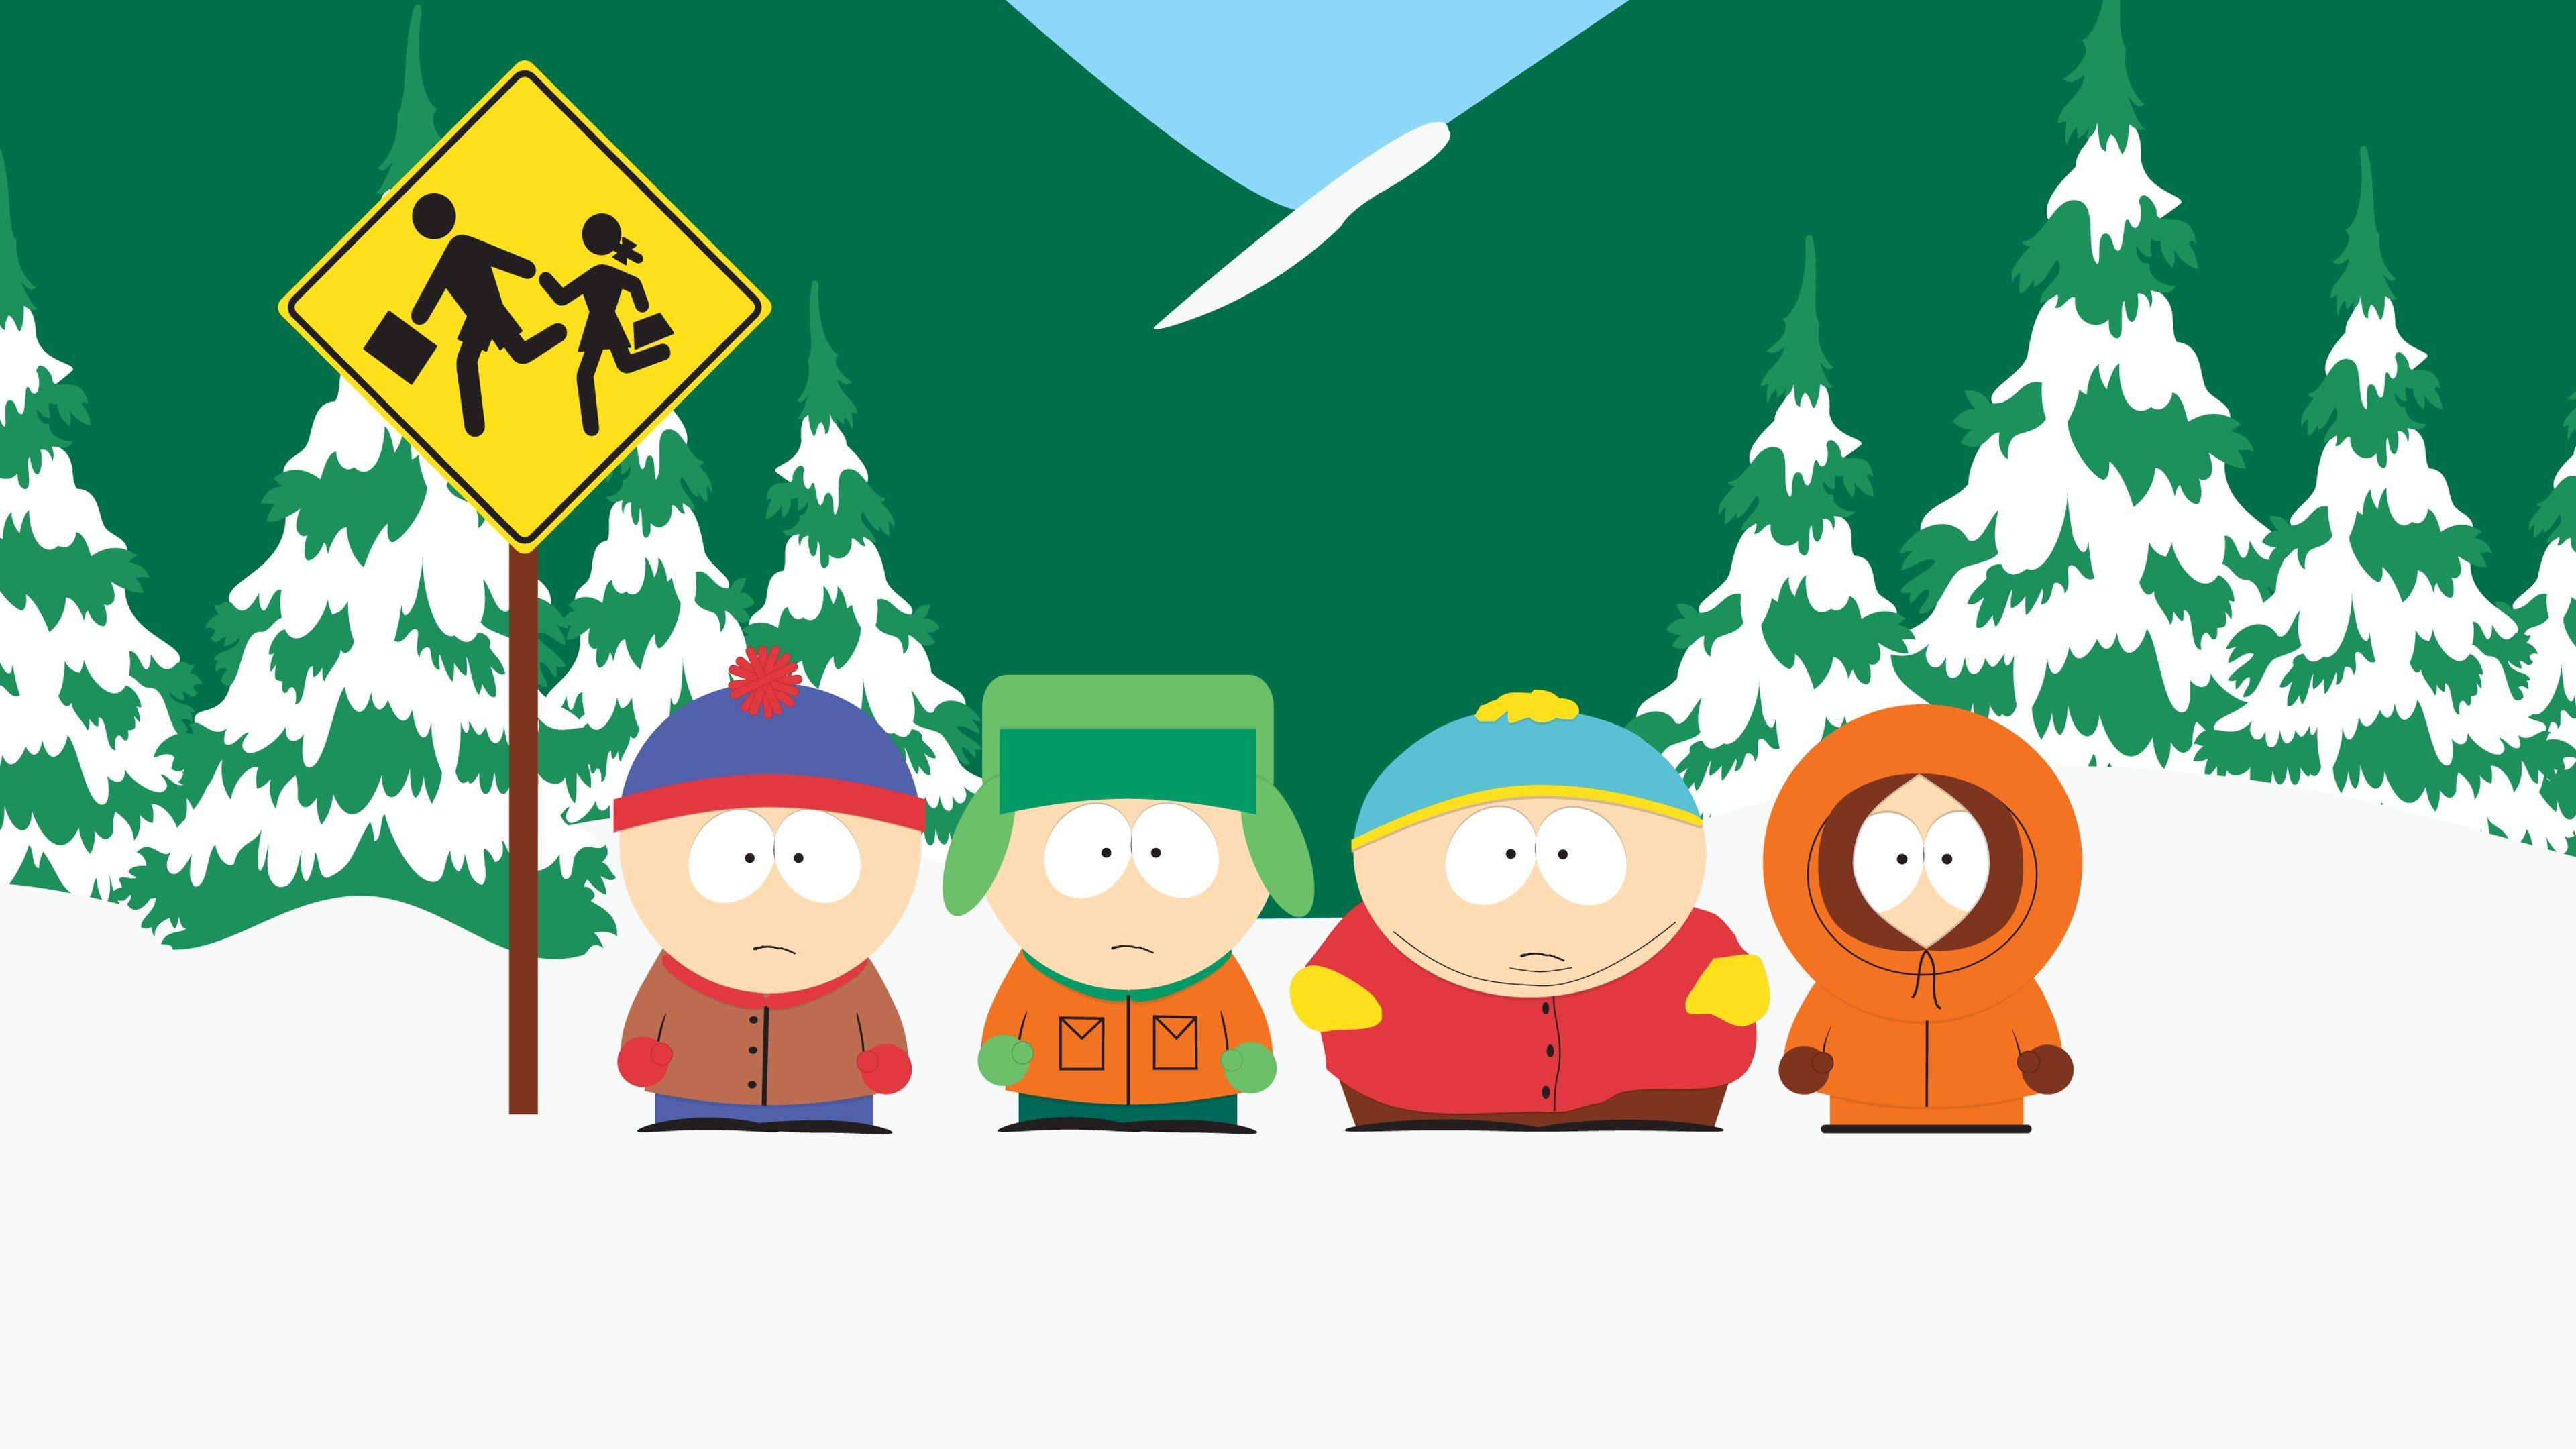 4k South Park Hd Wallpaper 3840x2160 South Park Pinterest